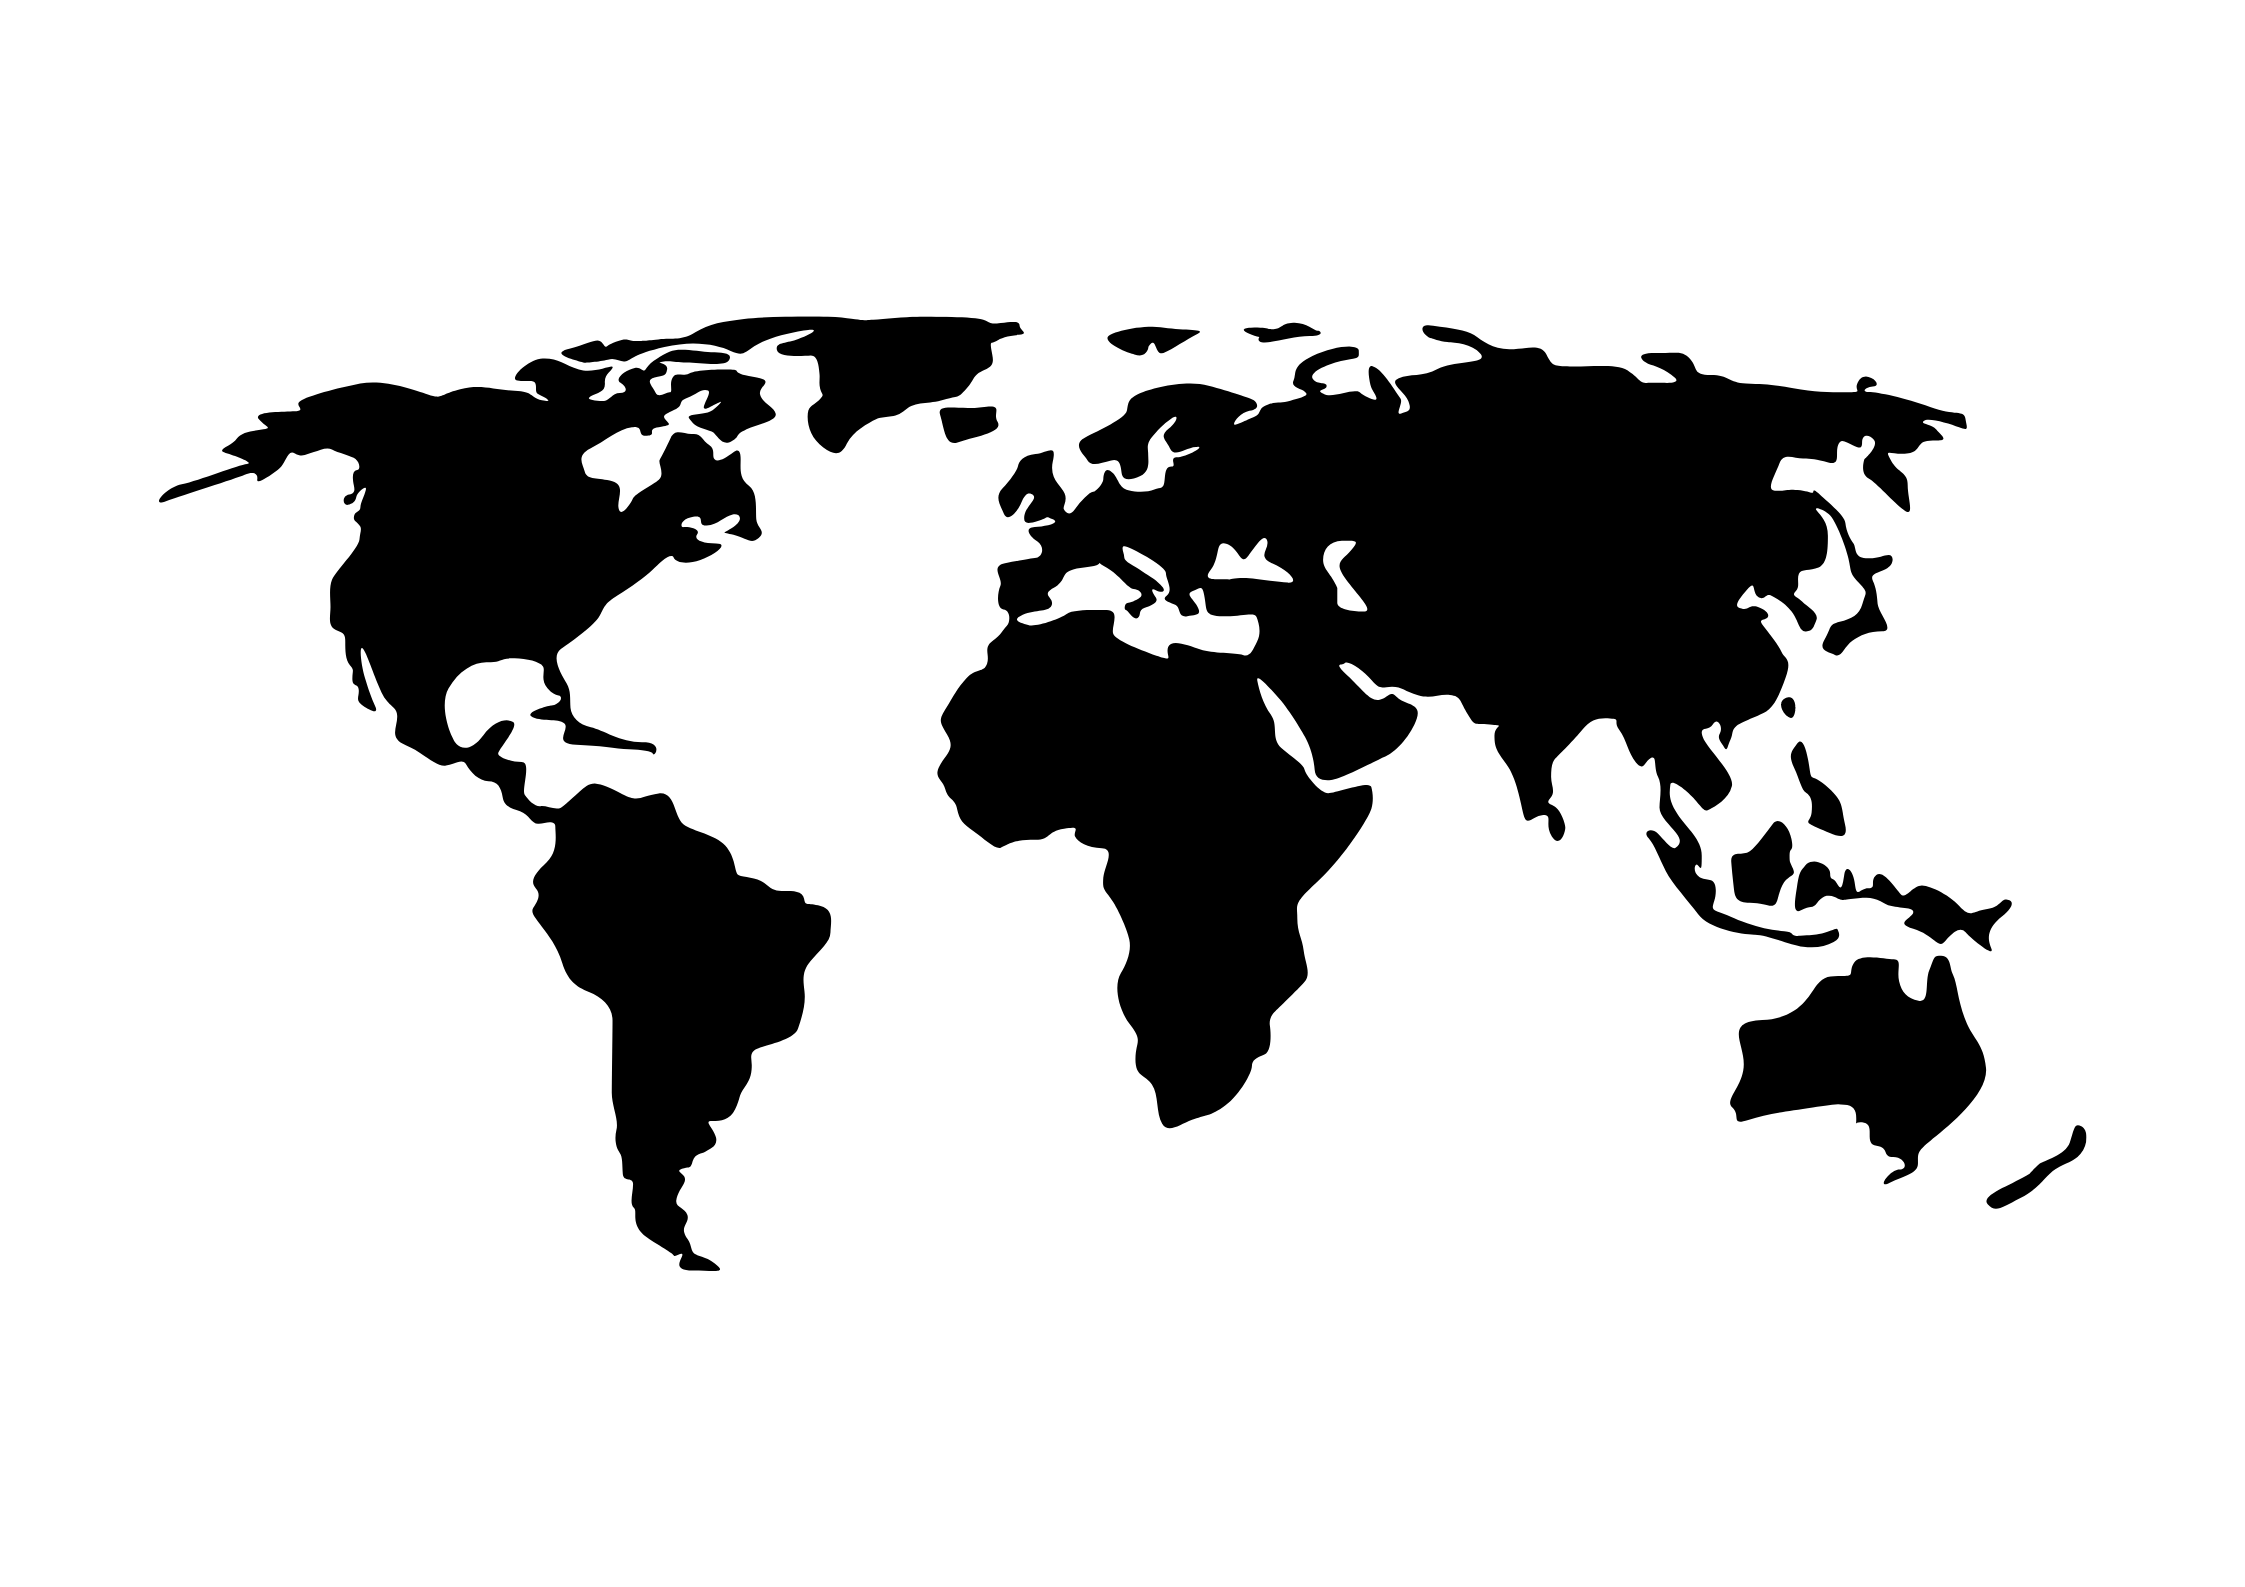 POSTER DIGITAL - Mapa Mundi no Elo7 | Coletivo Soul